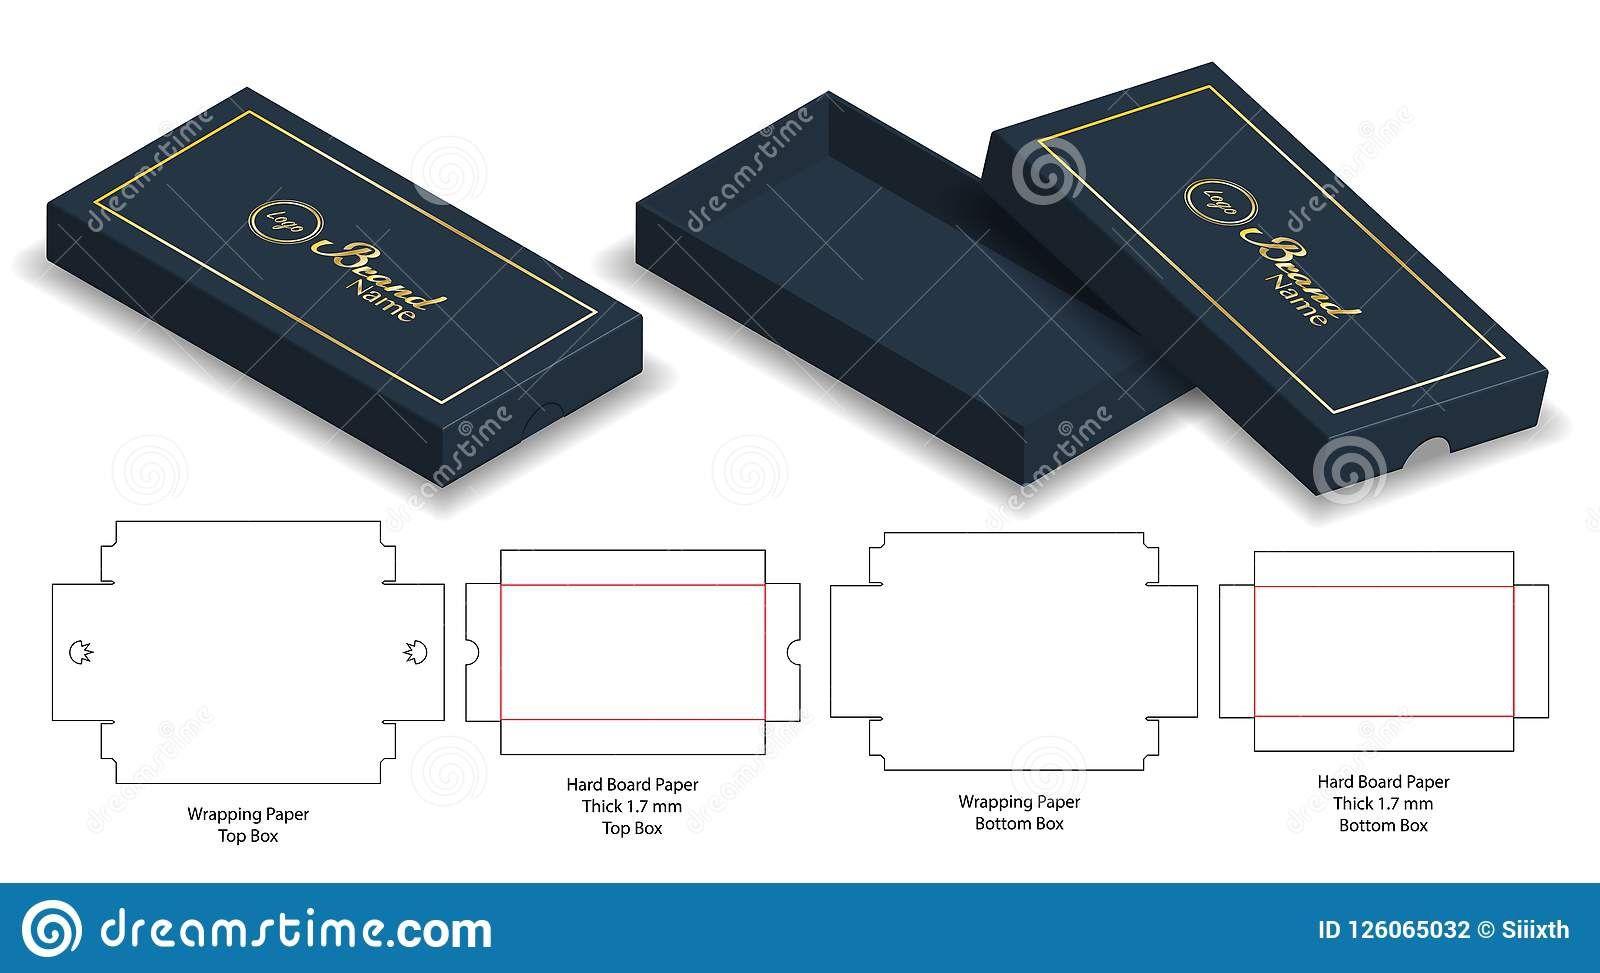 006 Wondrou Box Design Template Free Image  Text Download PackagingFull